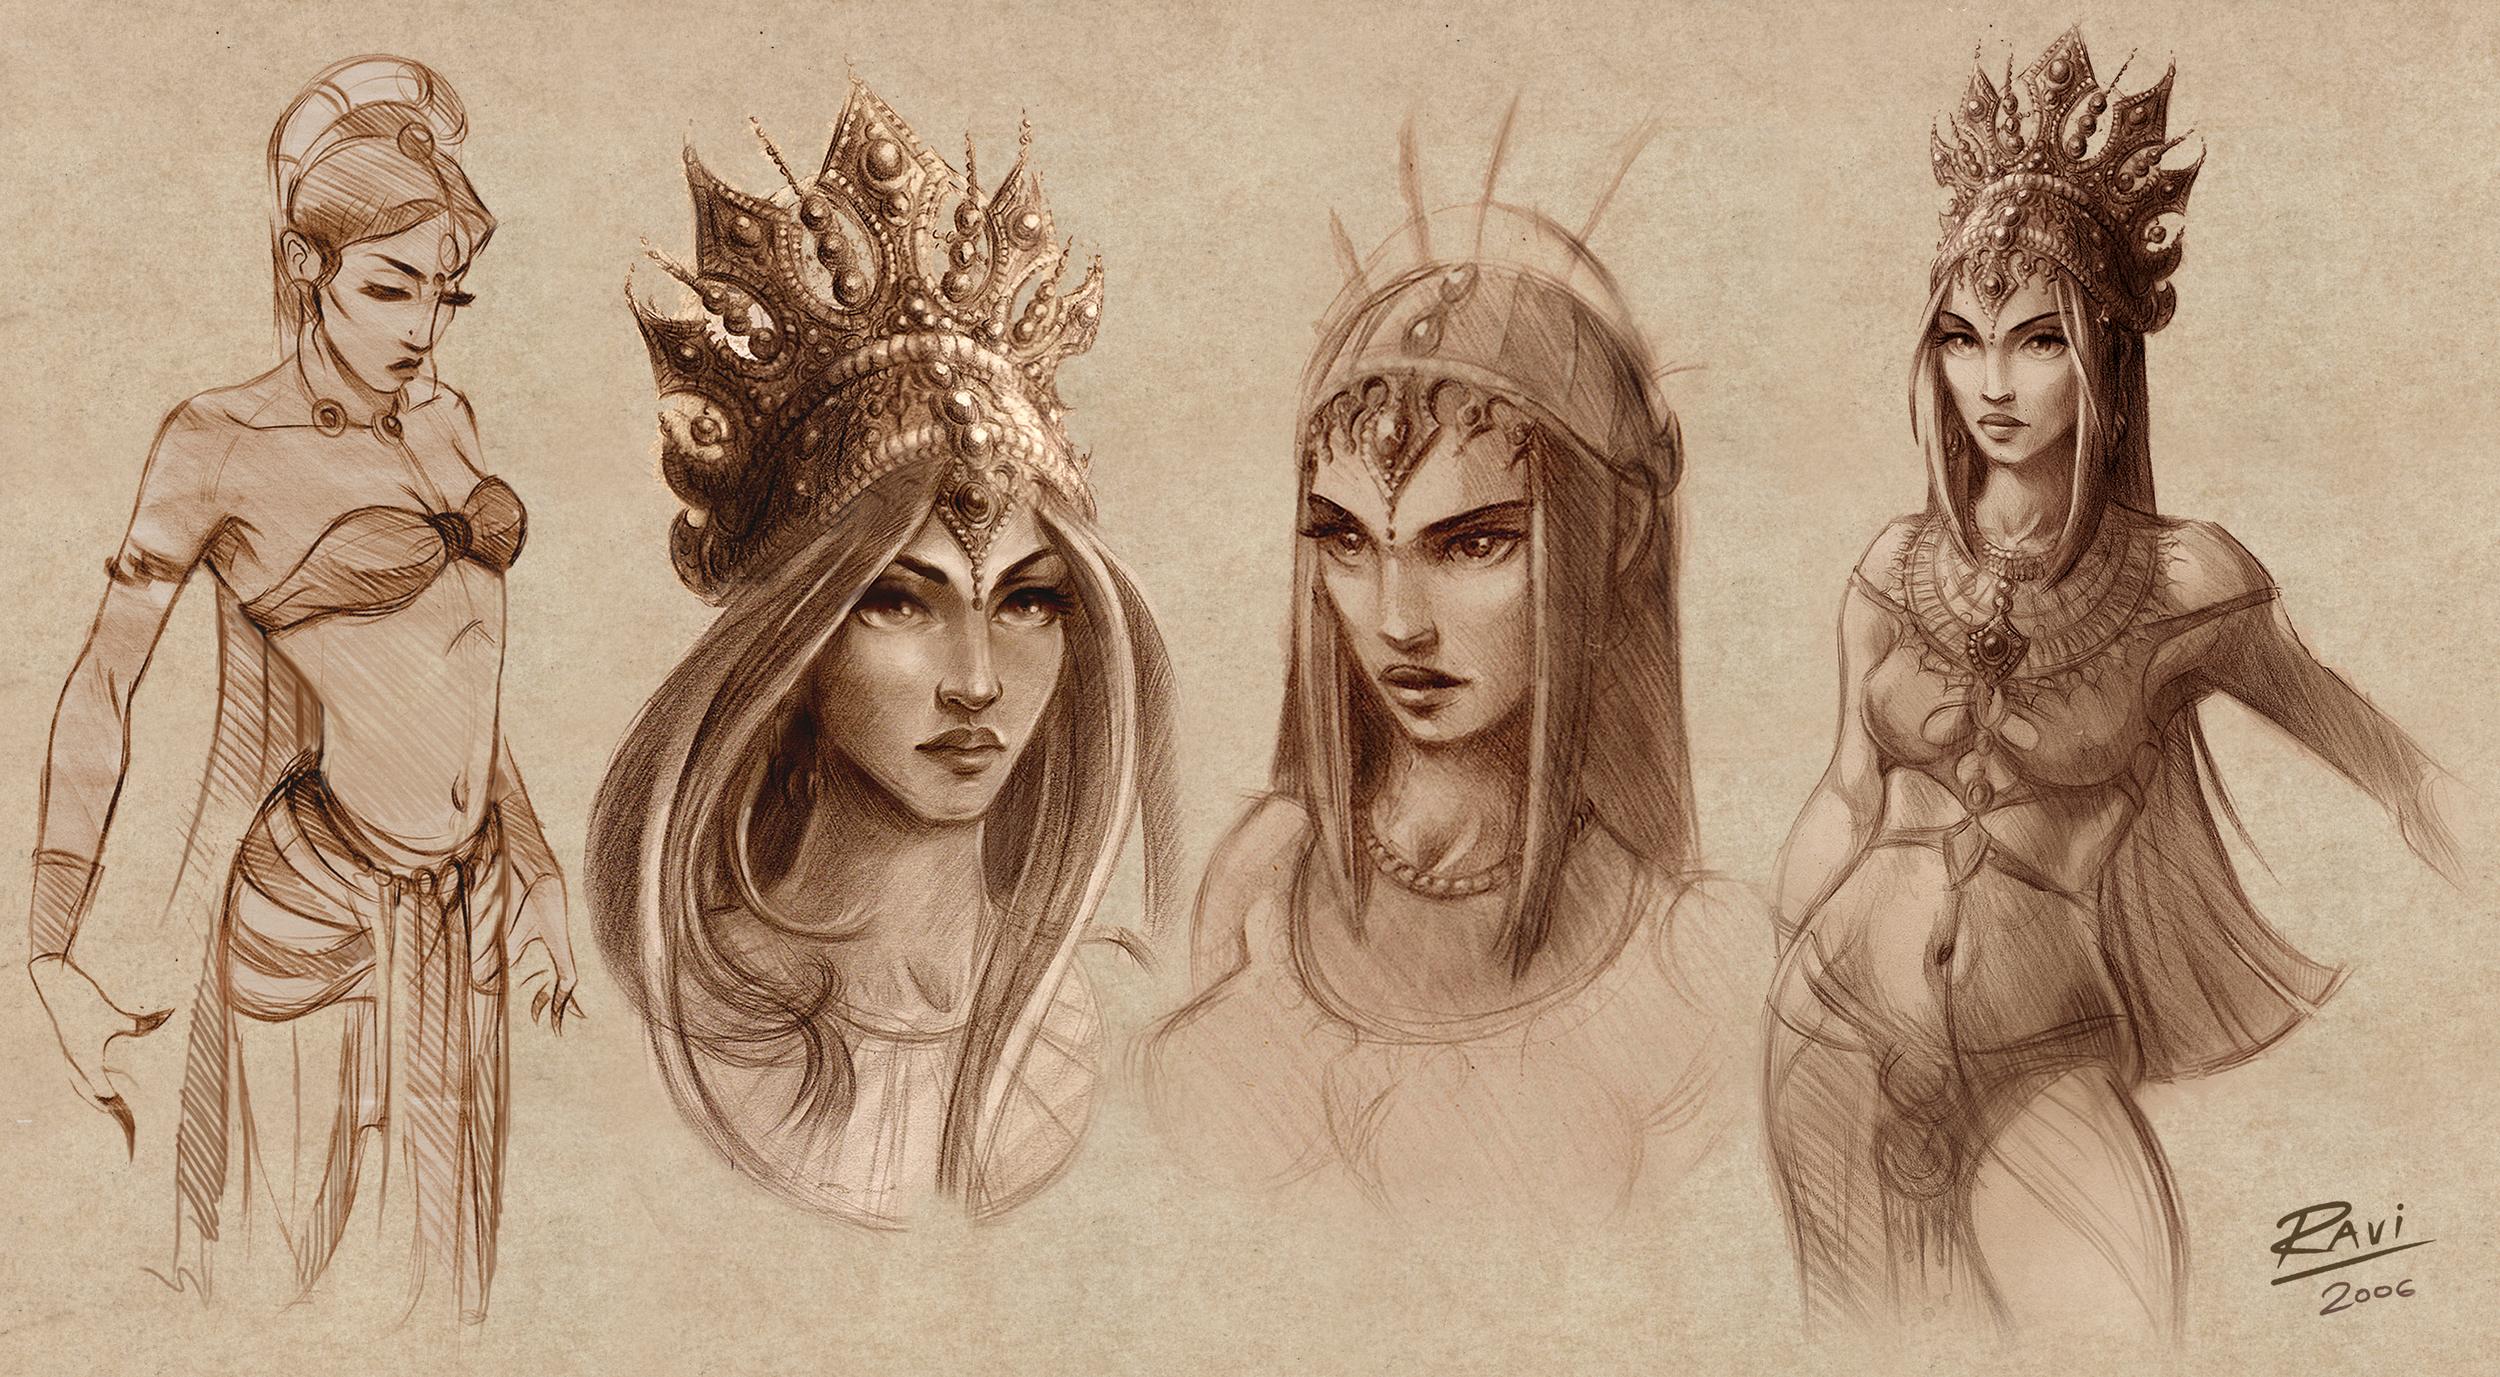 Ravinder kundi - Final Journey sketches